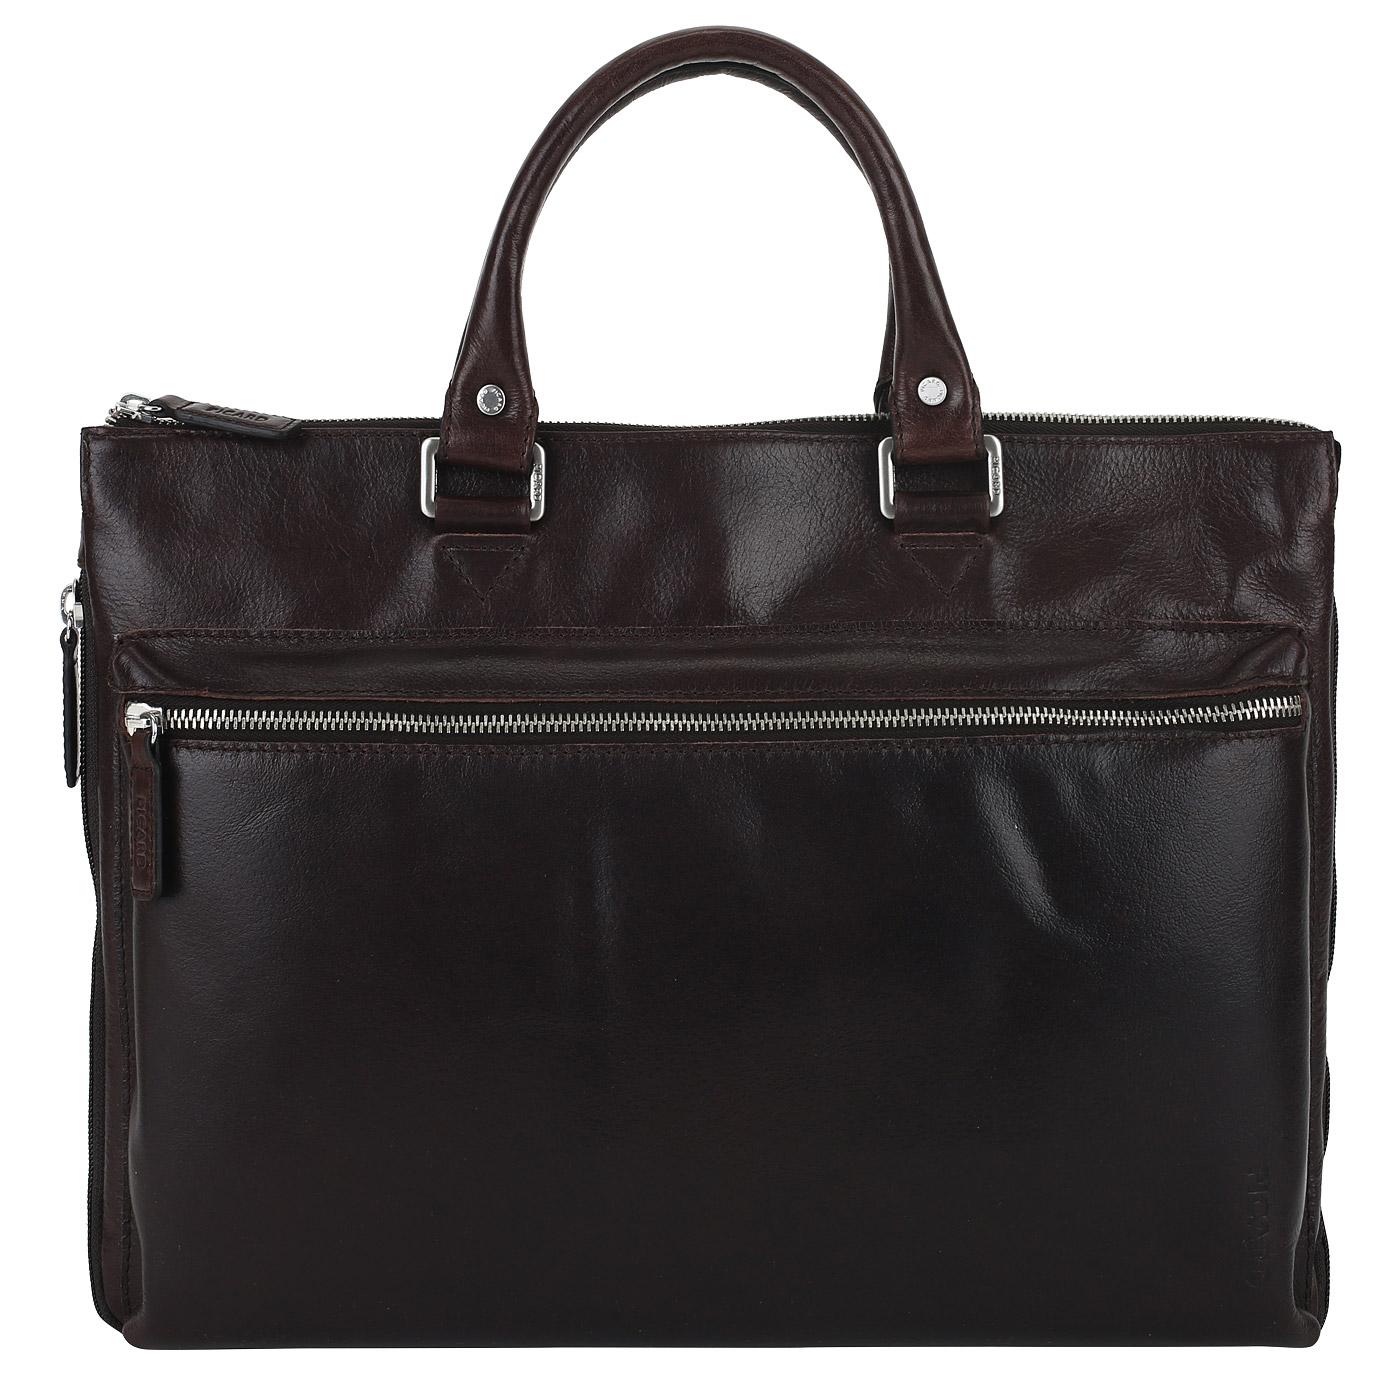 8a8b322a2b29 Мужская сумка мужская, глянец,, Сумки мужские Picard — интернет-магазин  Burguy.ru ...